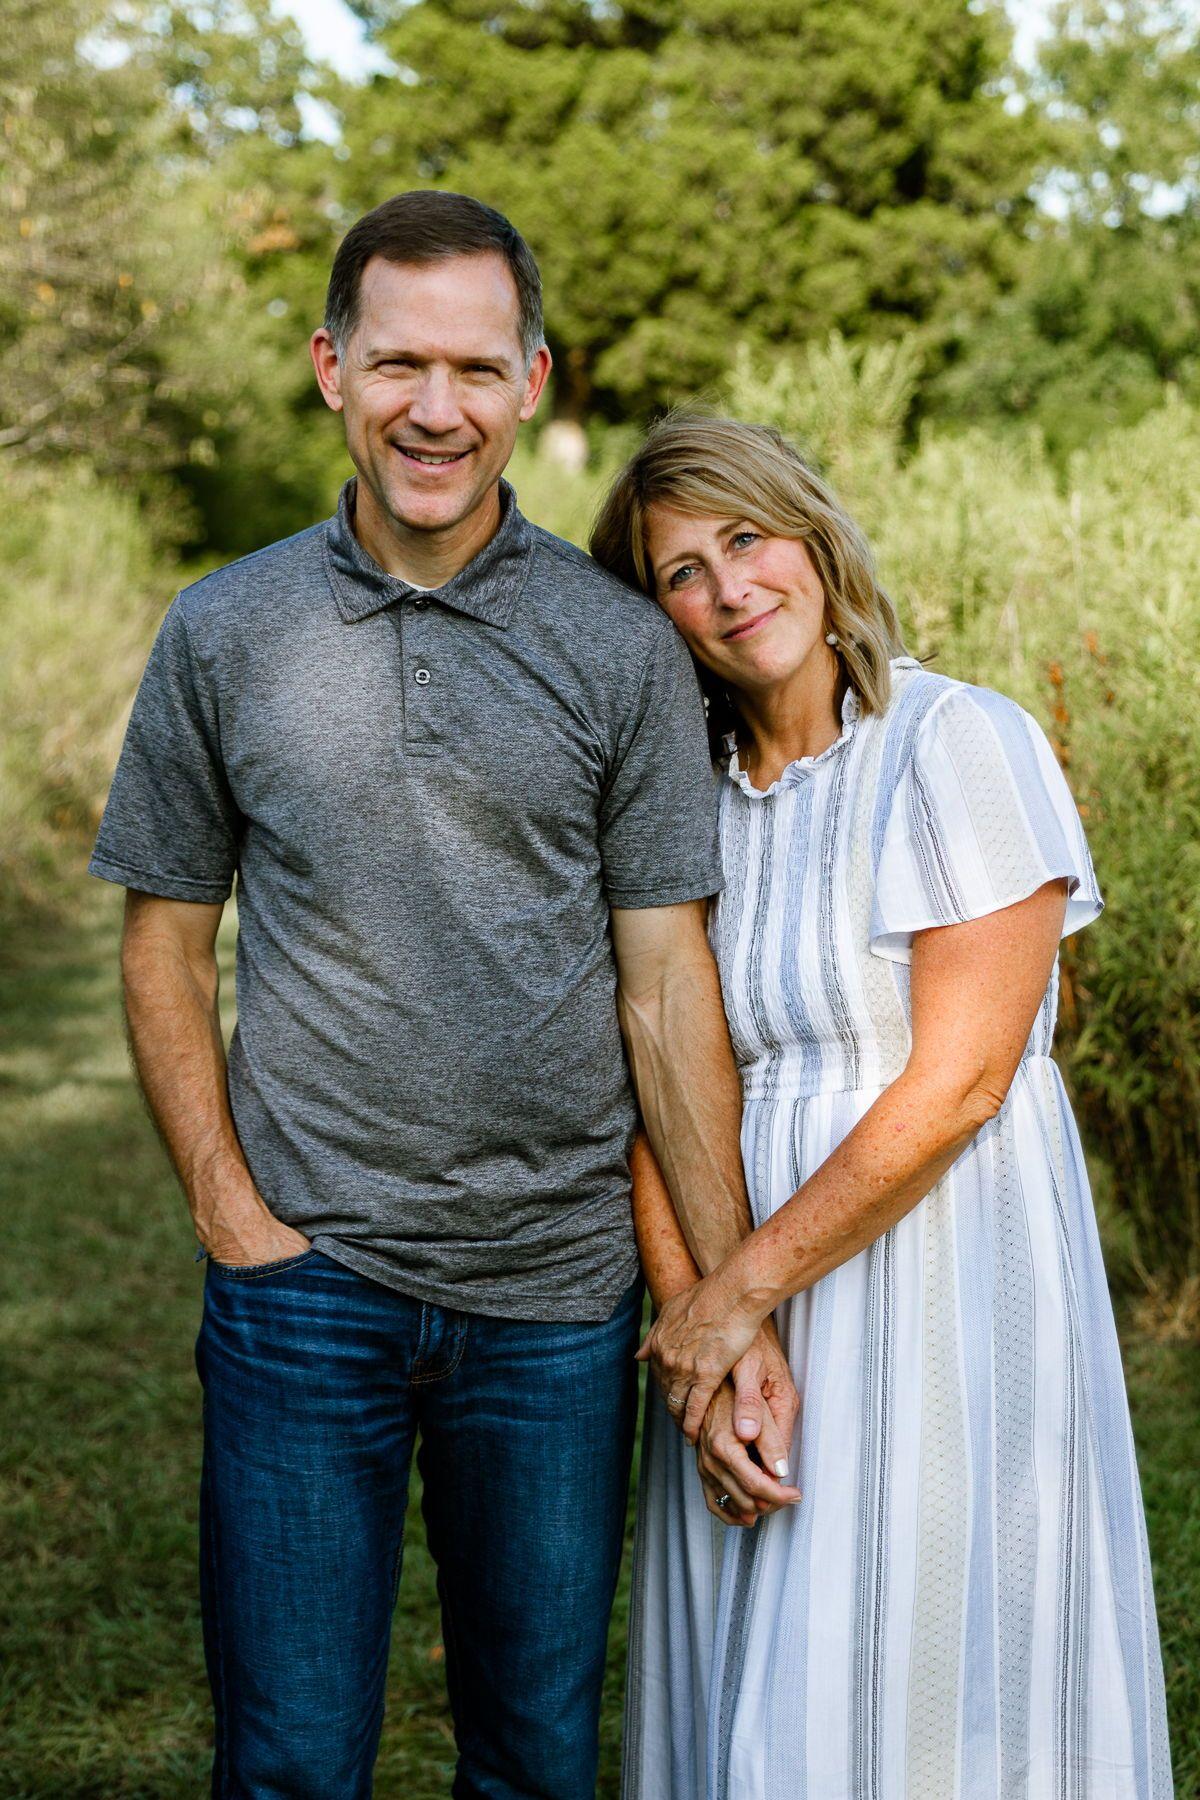 , Katie Baker Creative – Los Angeles Wedding Photographer, Anja Rubik Blog, Anja Rubik Blog